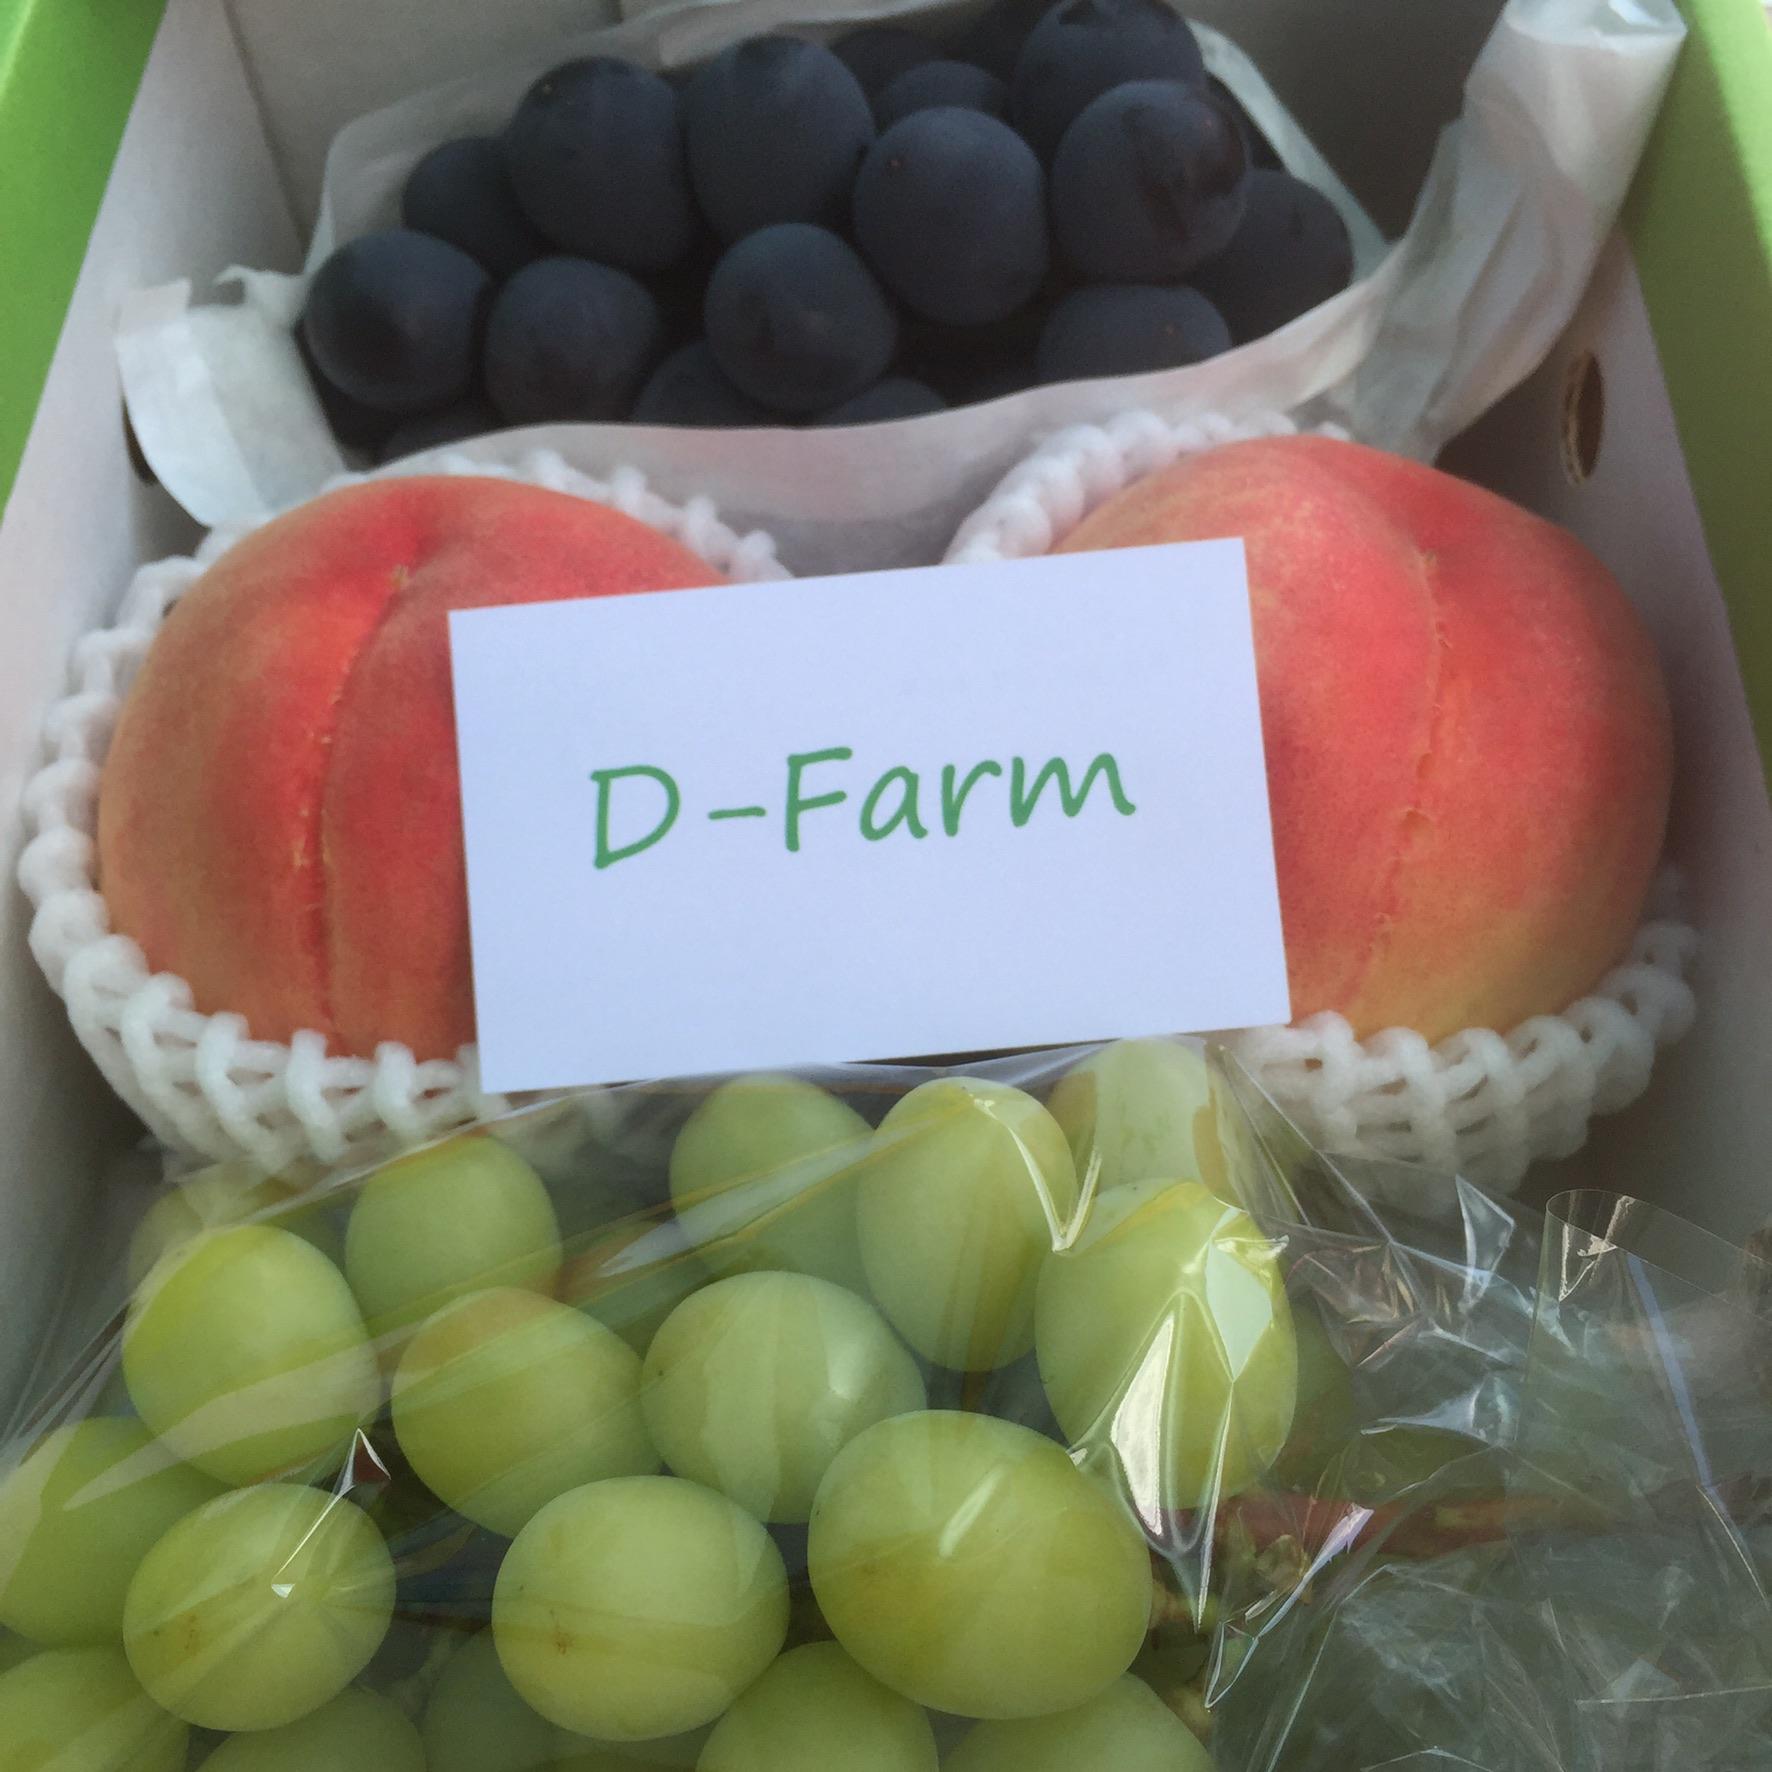 D-Farm